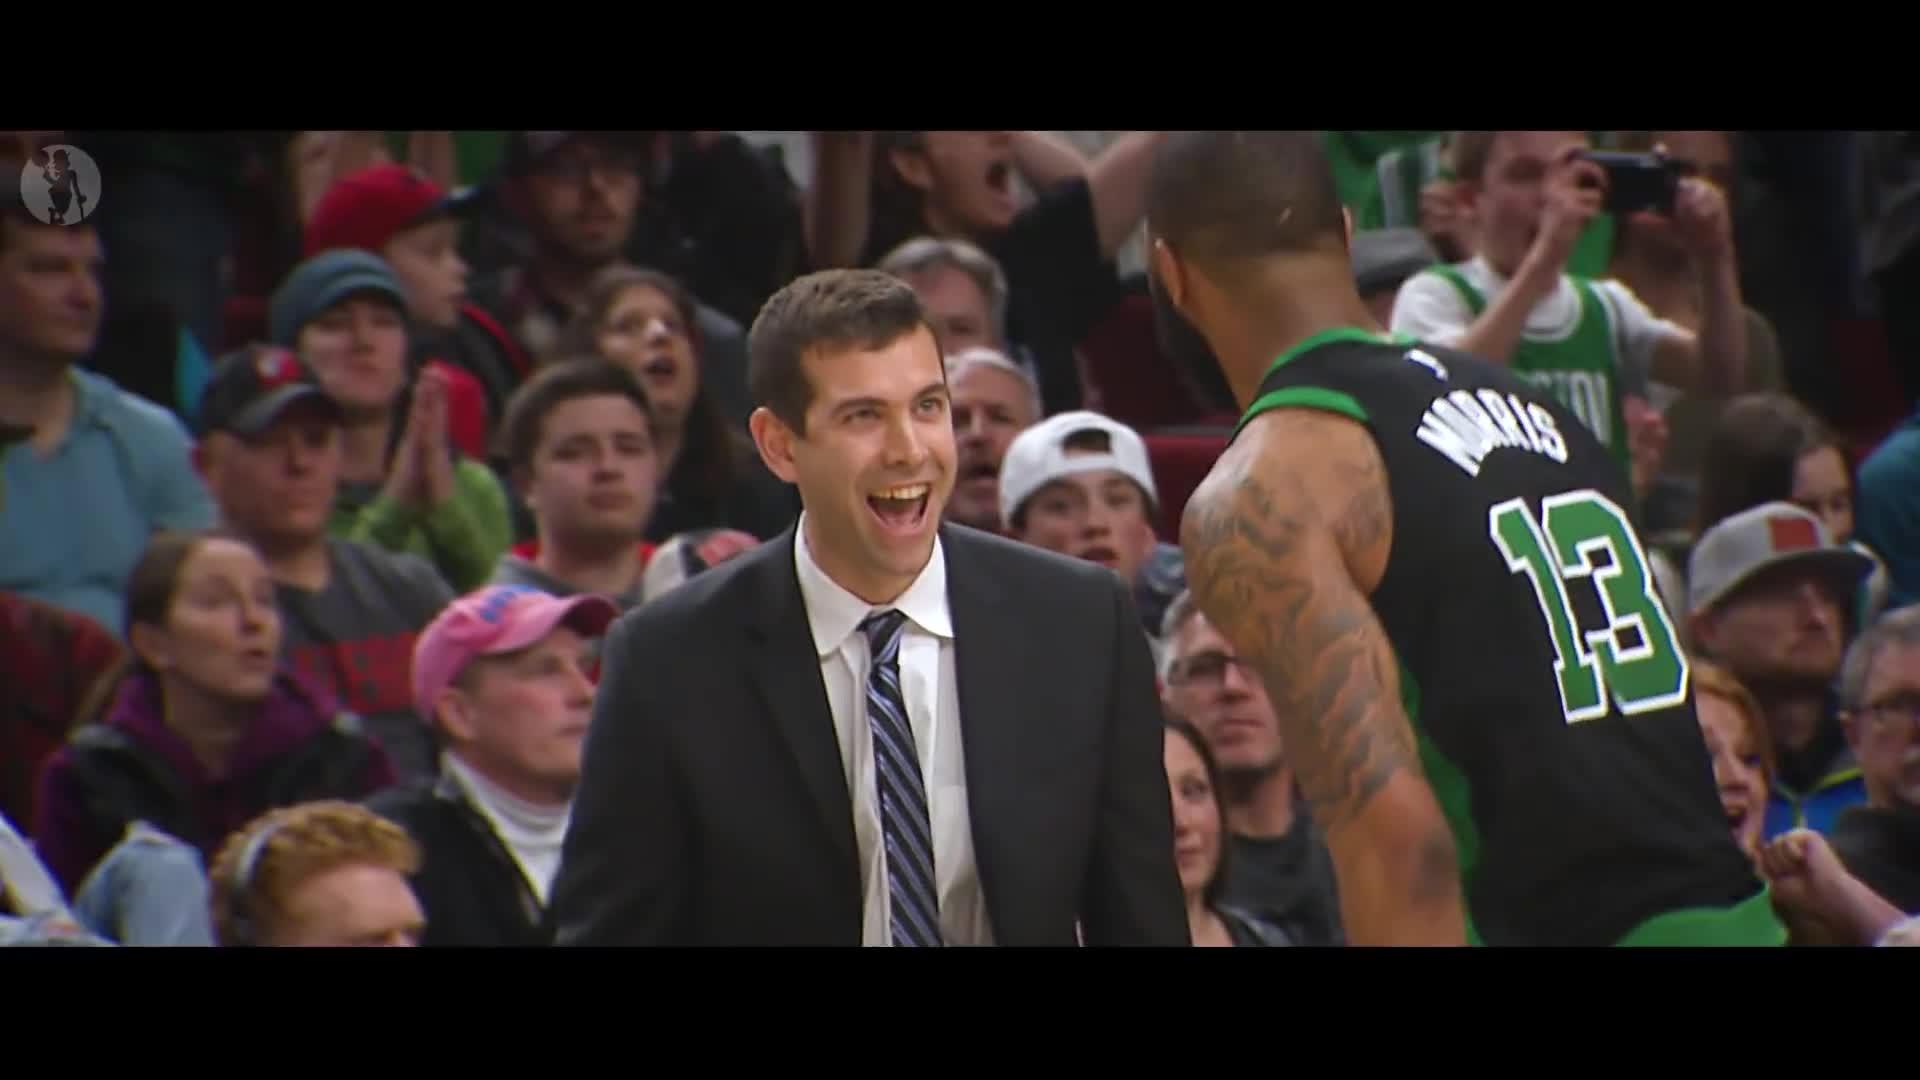 878ed558e OFFICIAL 2018 Celtics Playoff Trailer   CUsRise GIF